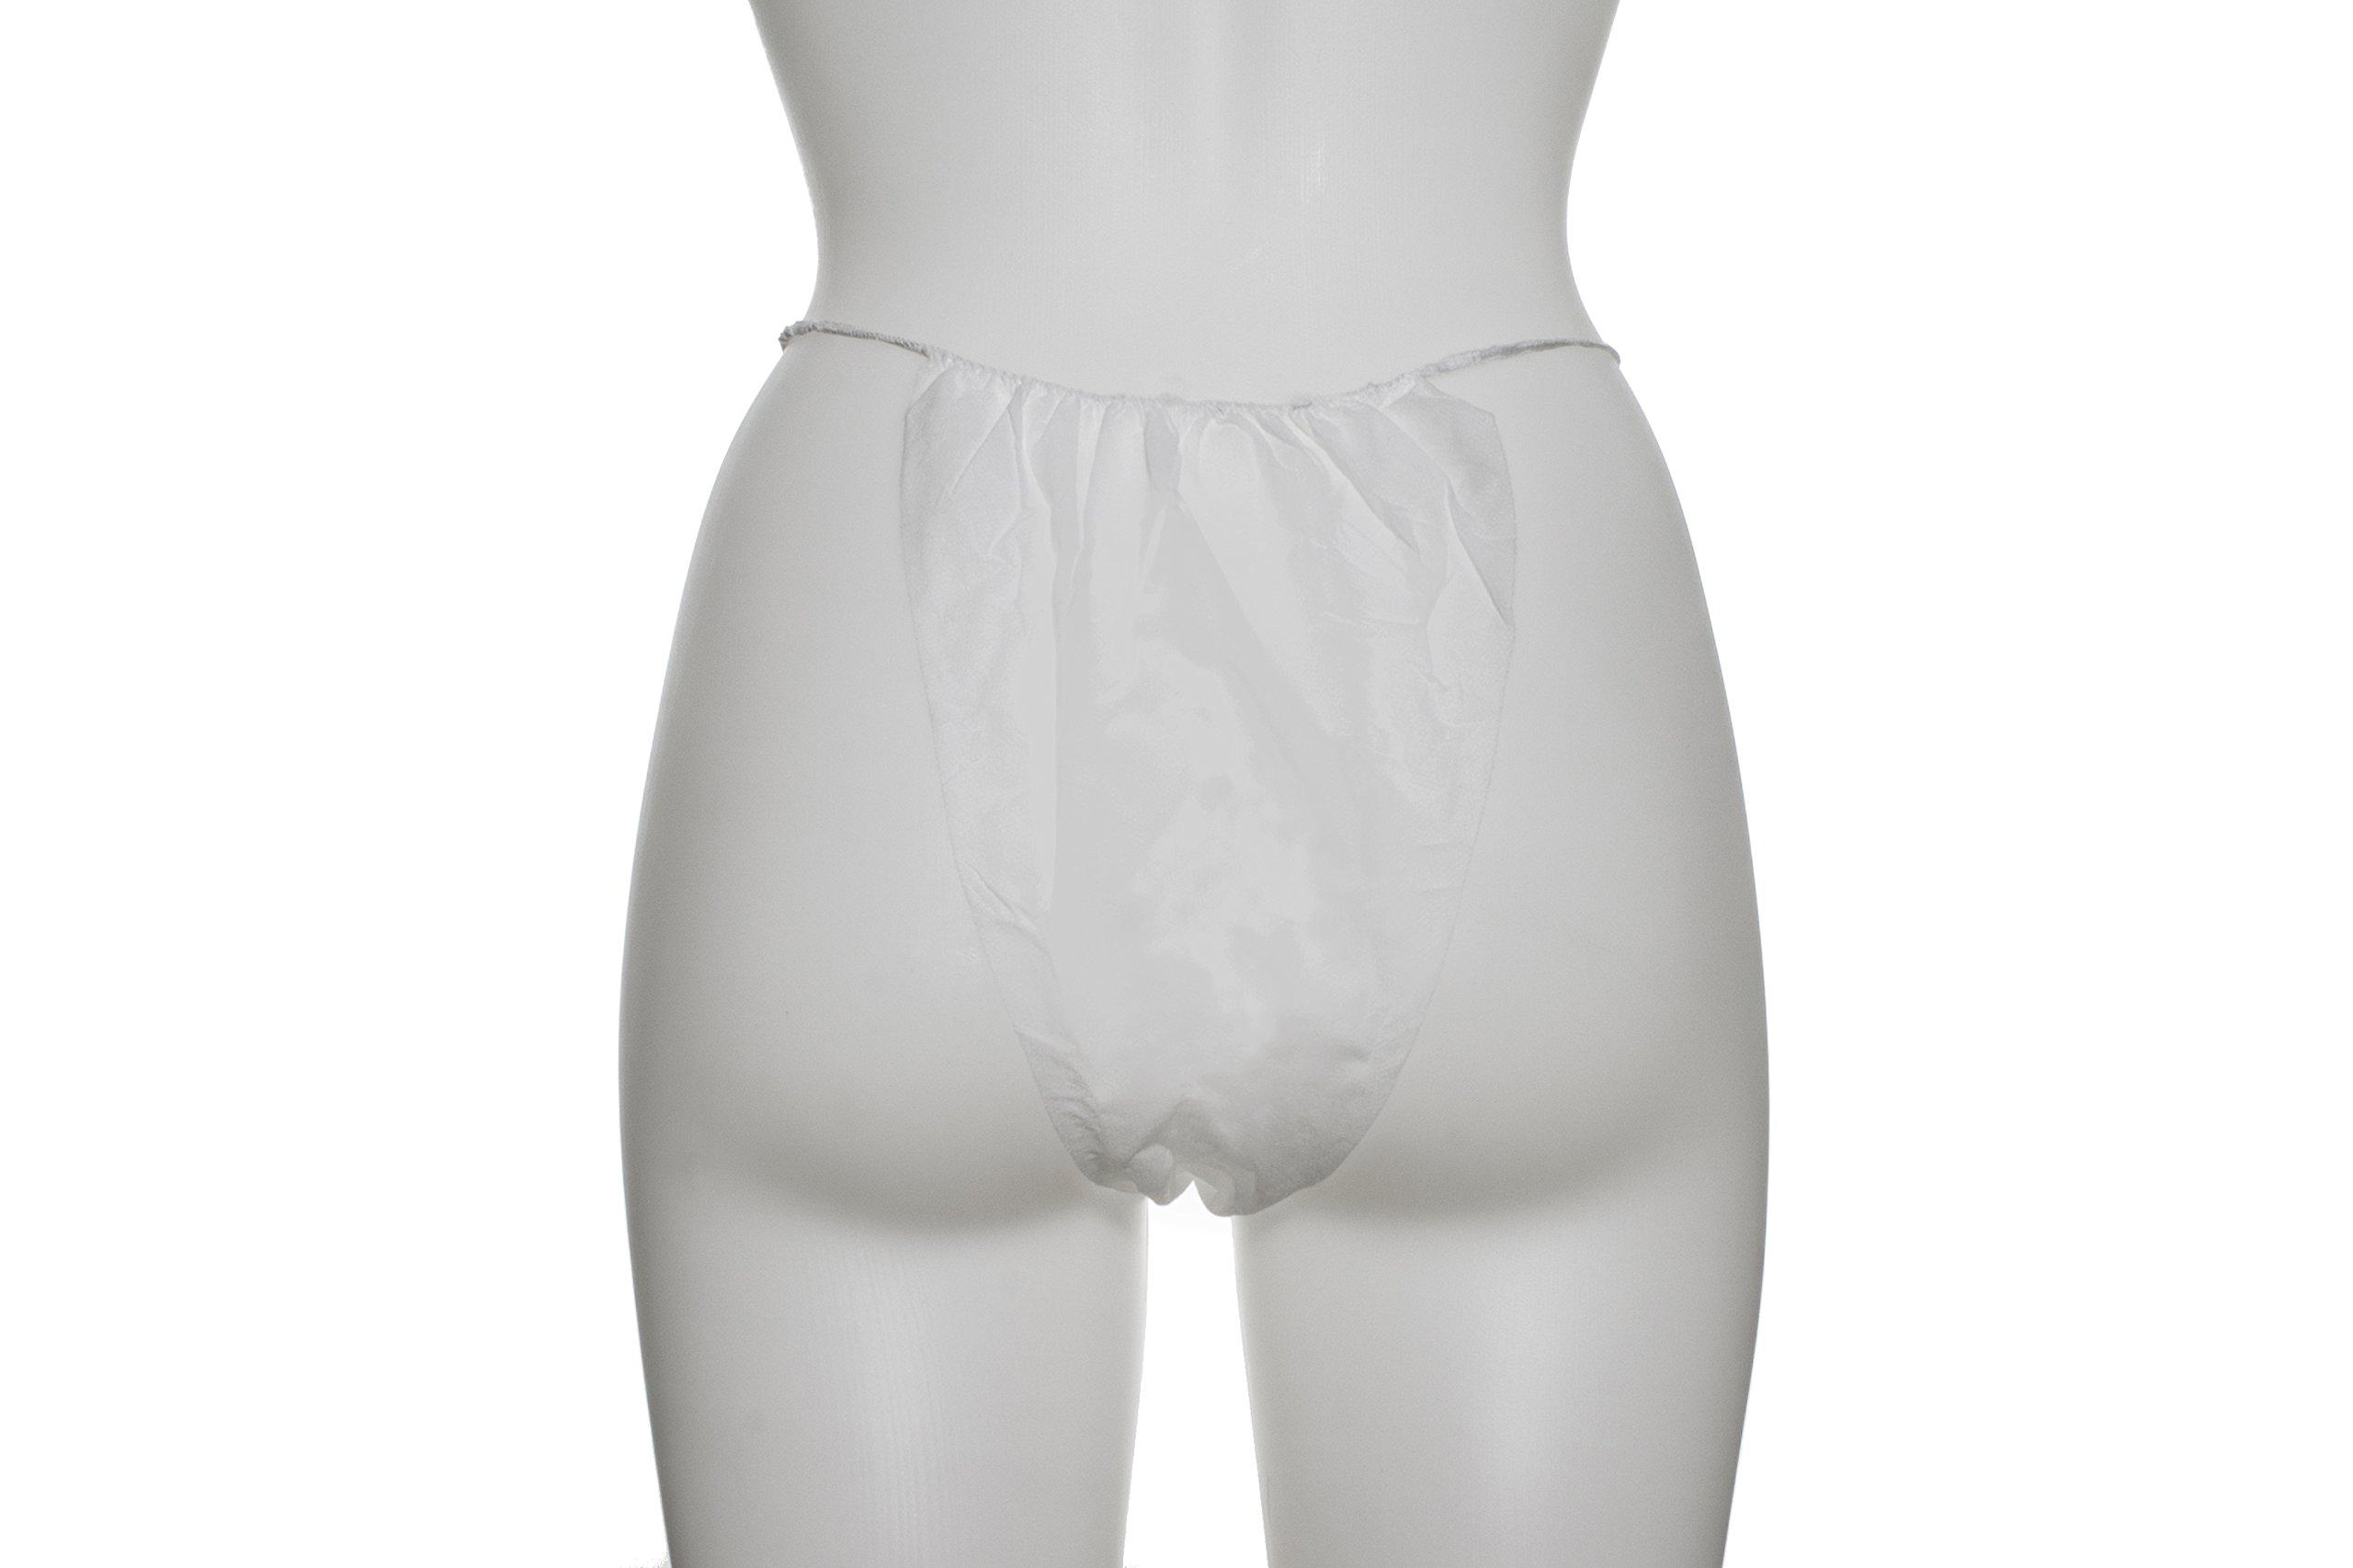 Dukal 900506-1 White Bikini Panty (Pack of 1000) by Dukal